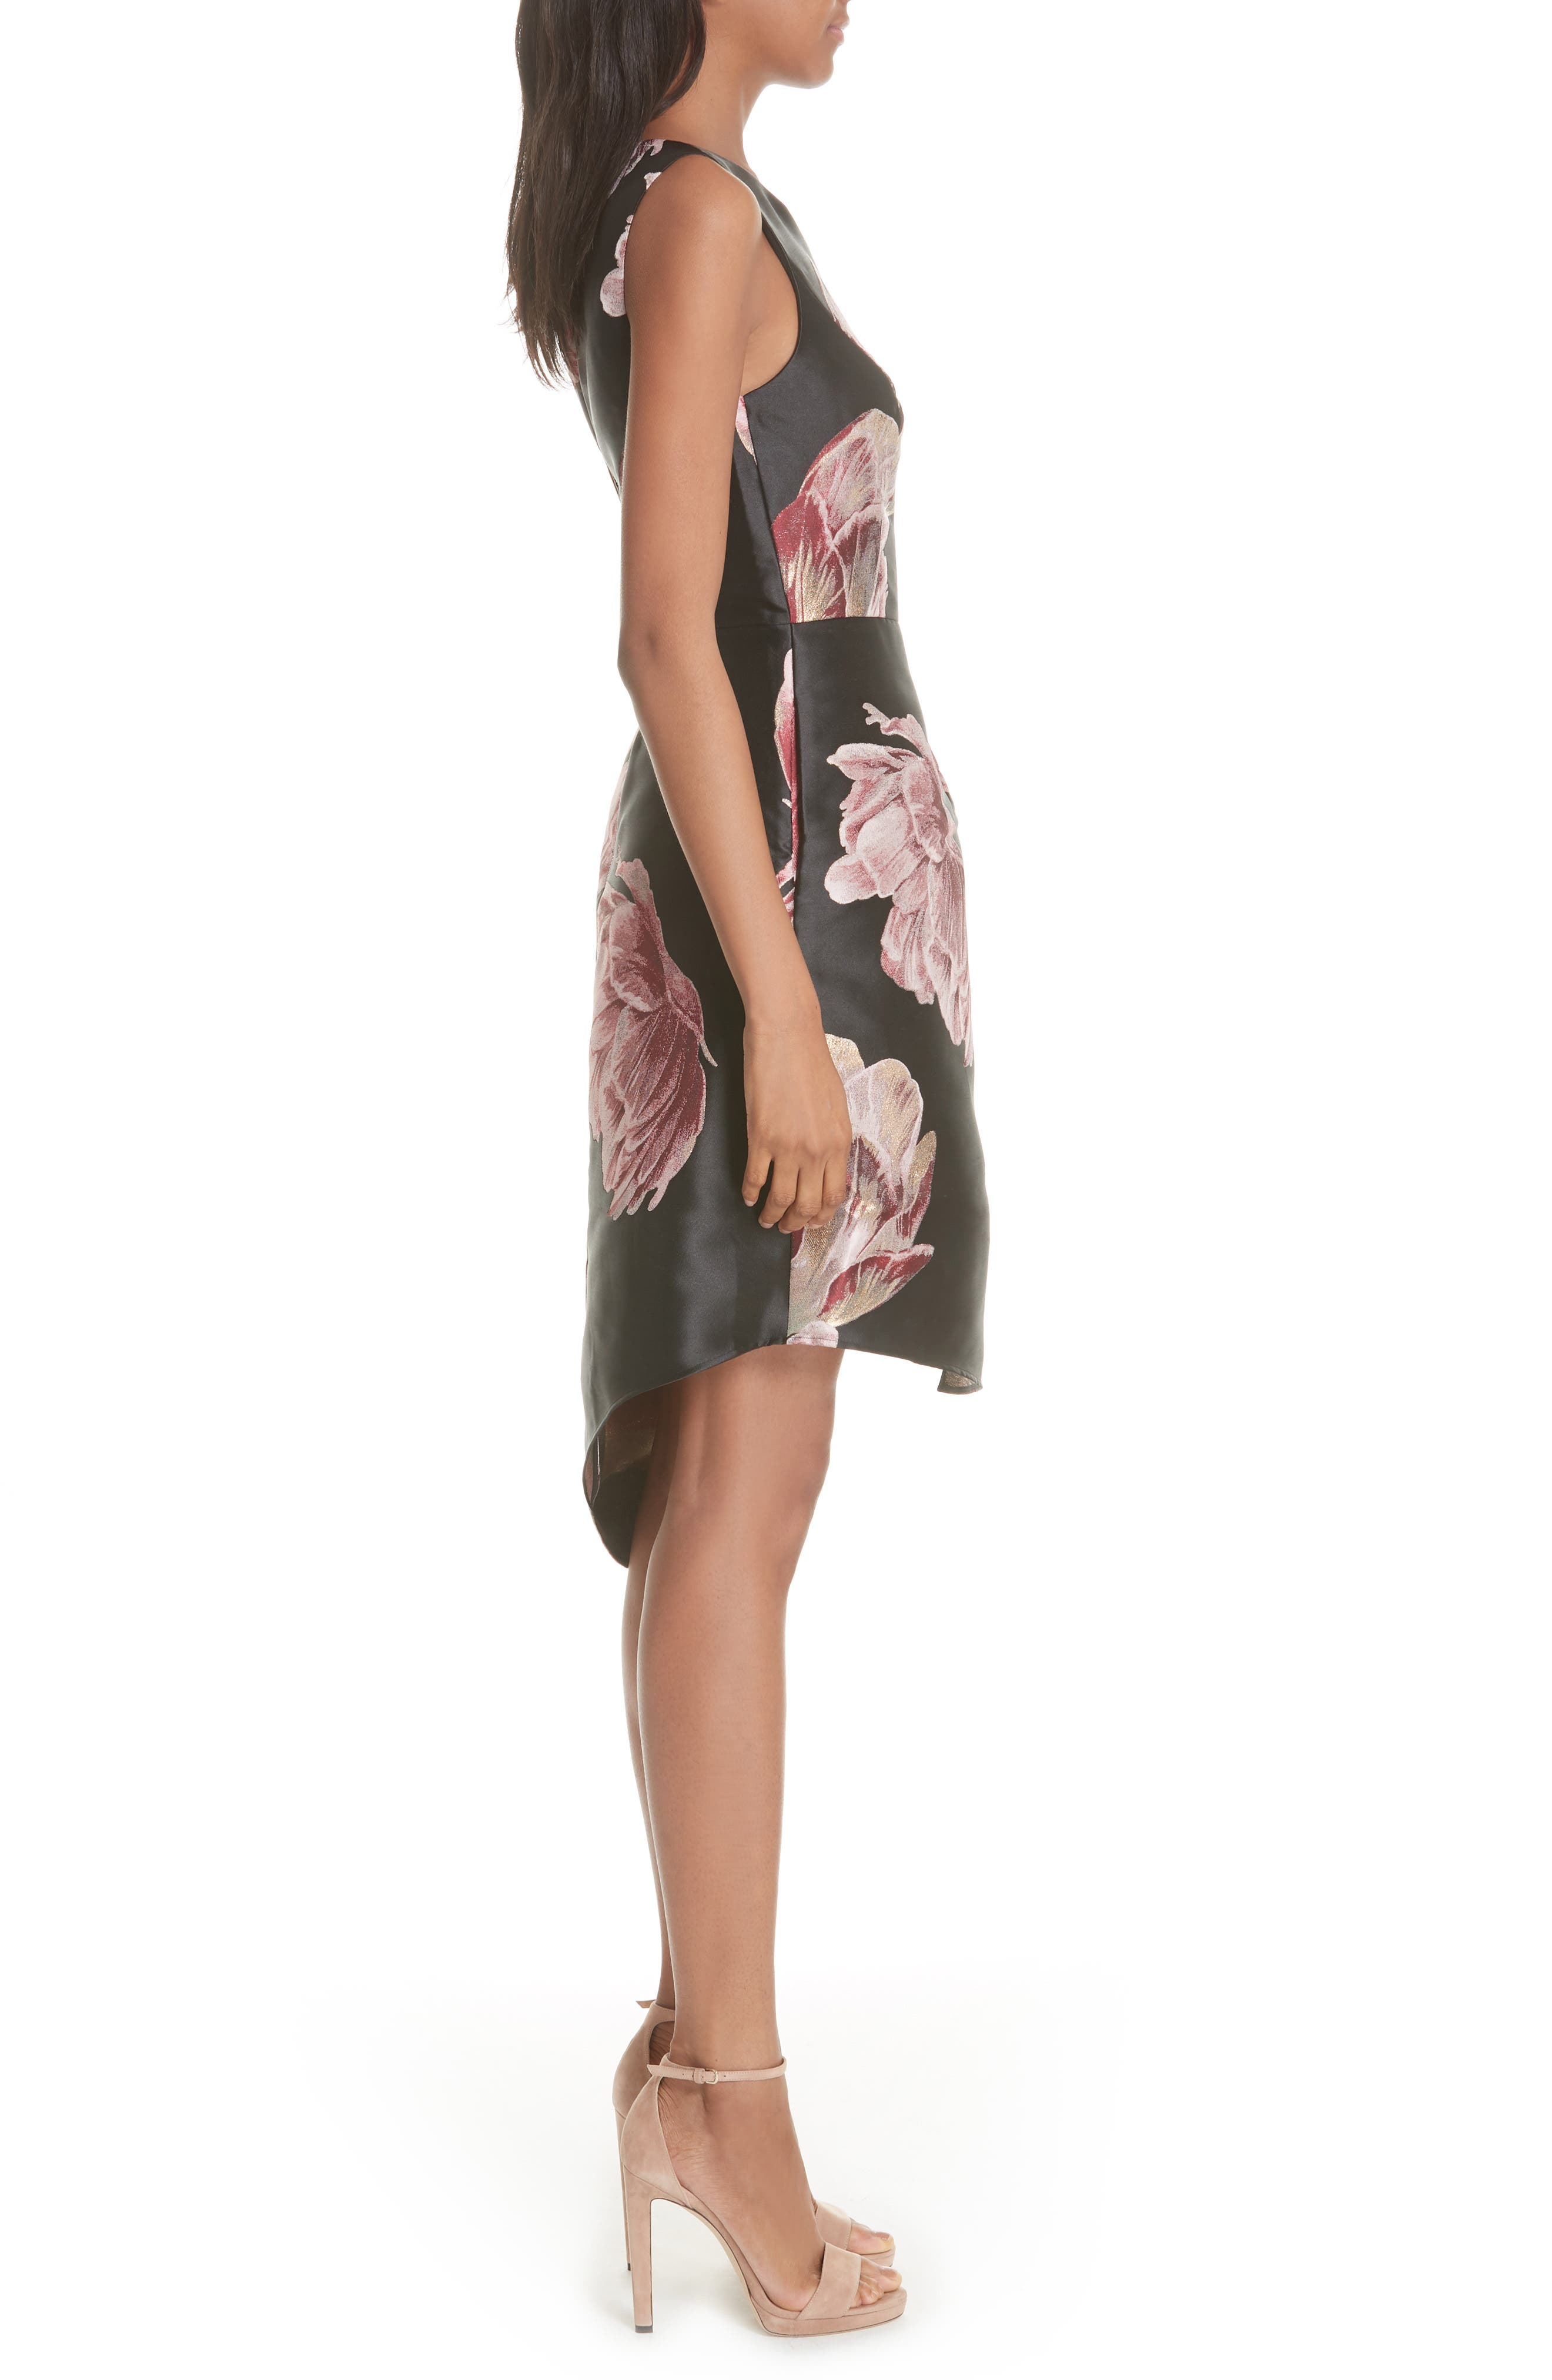 Eyvii Bay of Honour Asymmetrical Dress,                             Alternate thumbnail 3, color,                             001